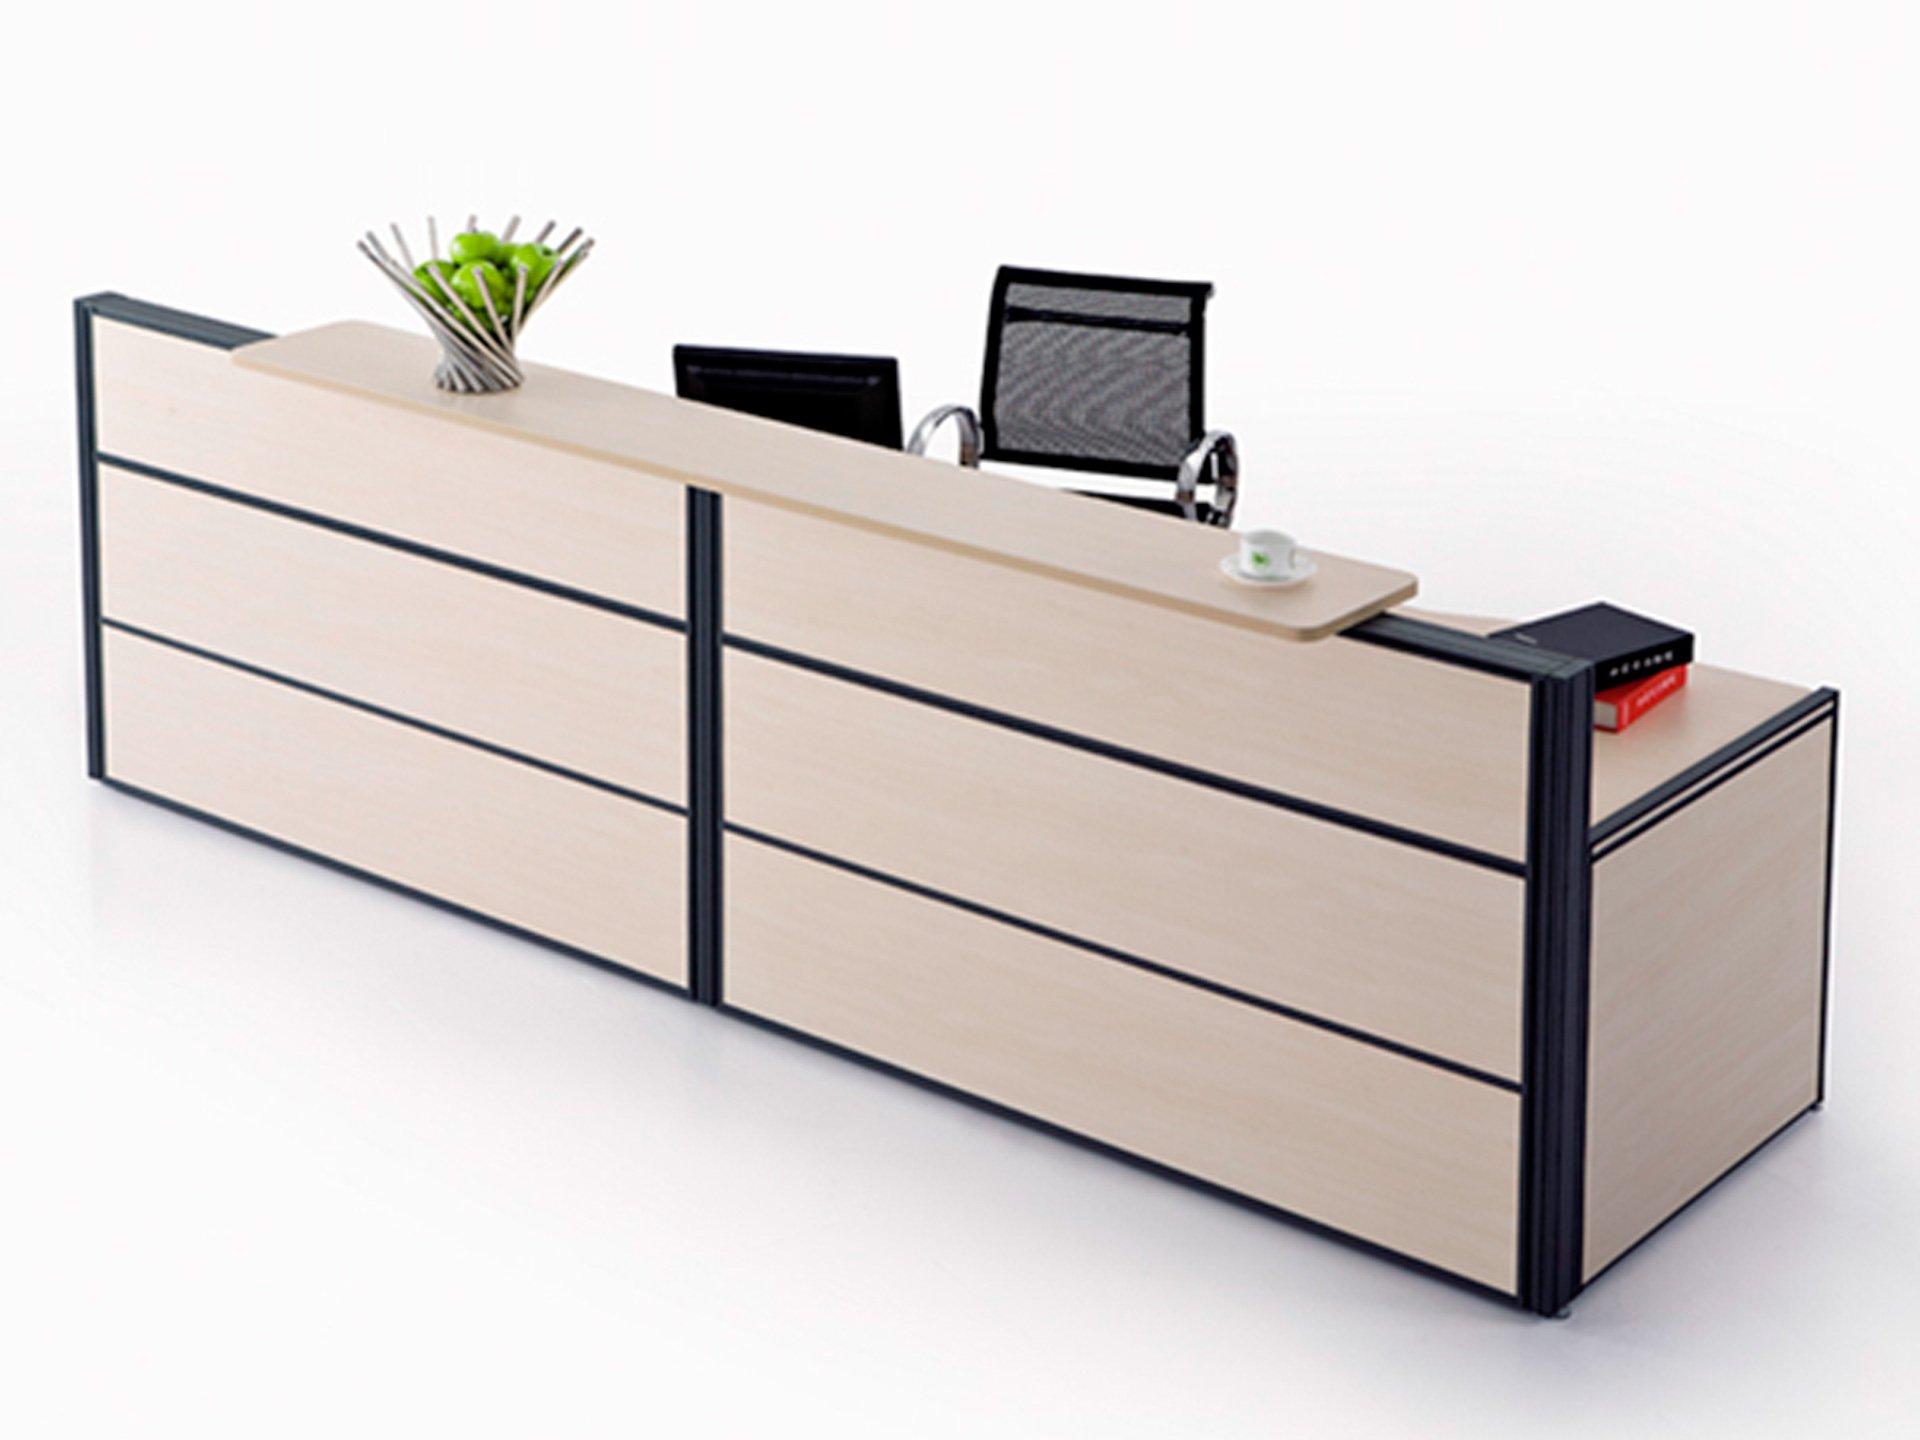 Muebles para oficina galleries un concepto diferente for Mobiliario para oficina precios